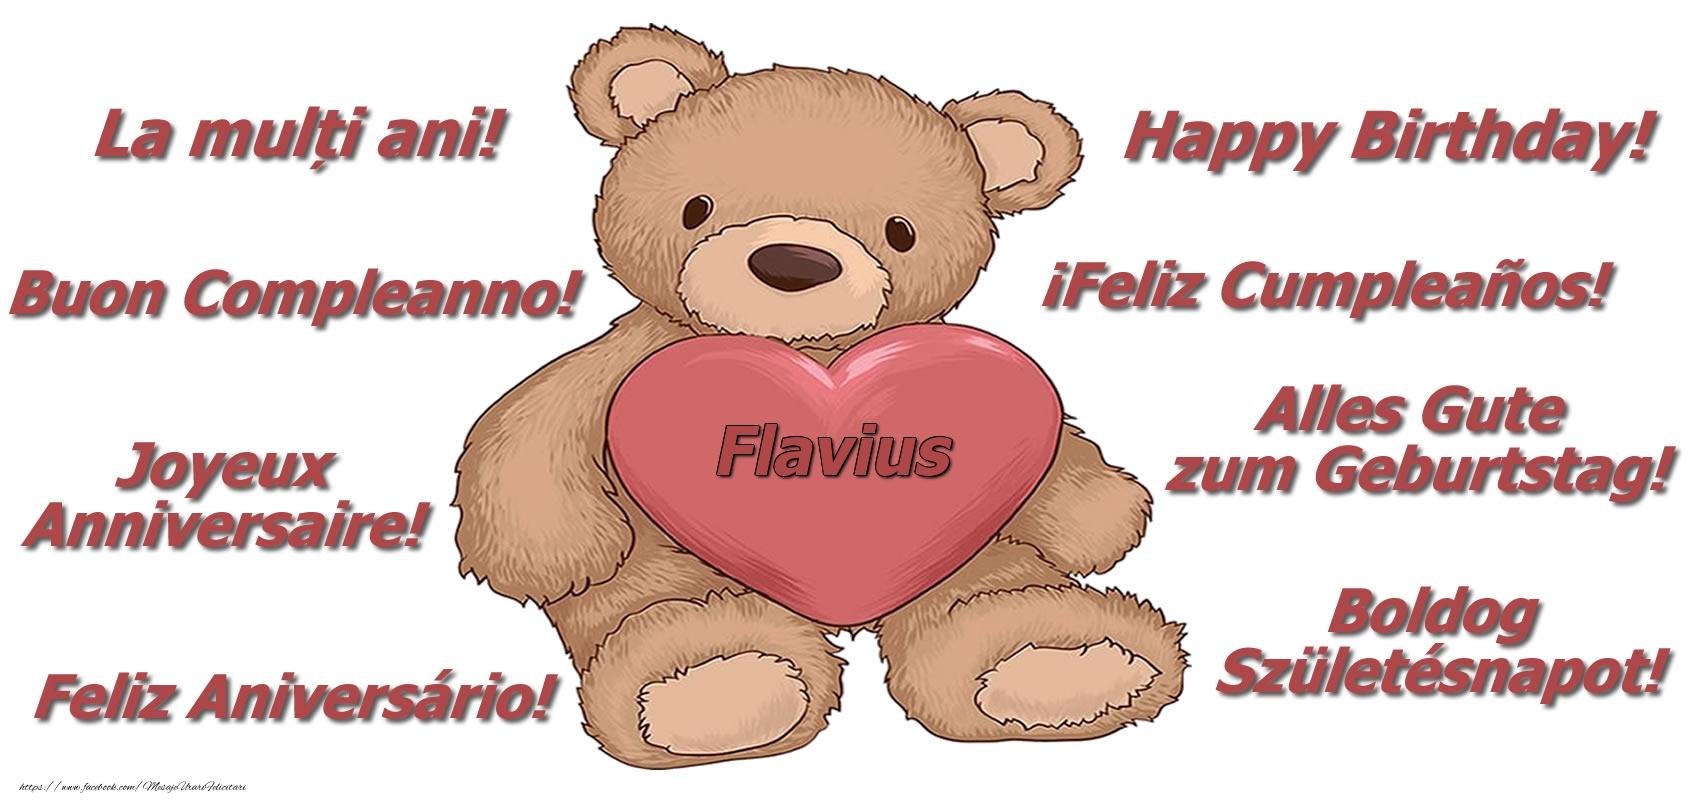 Felicitari de zi de nastere - La multi ani Flavius! - Ursulet